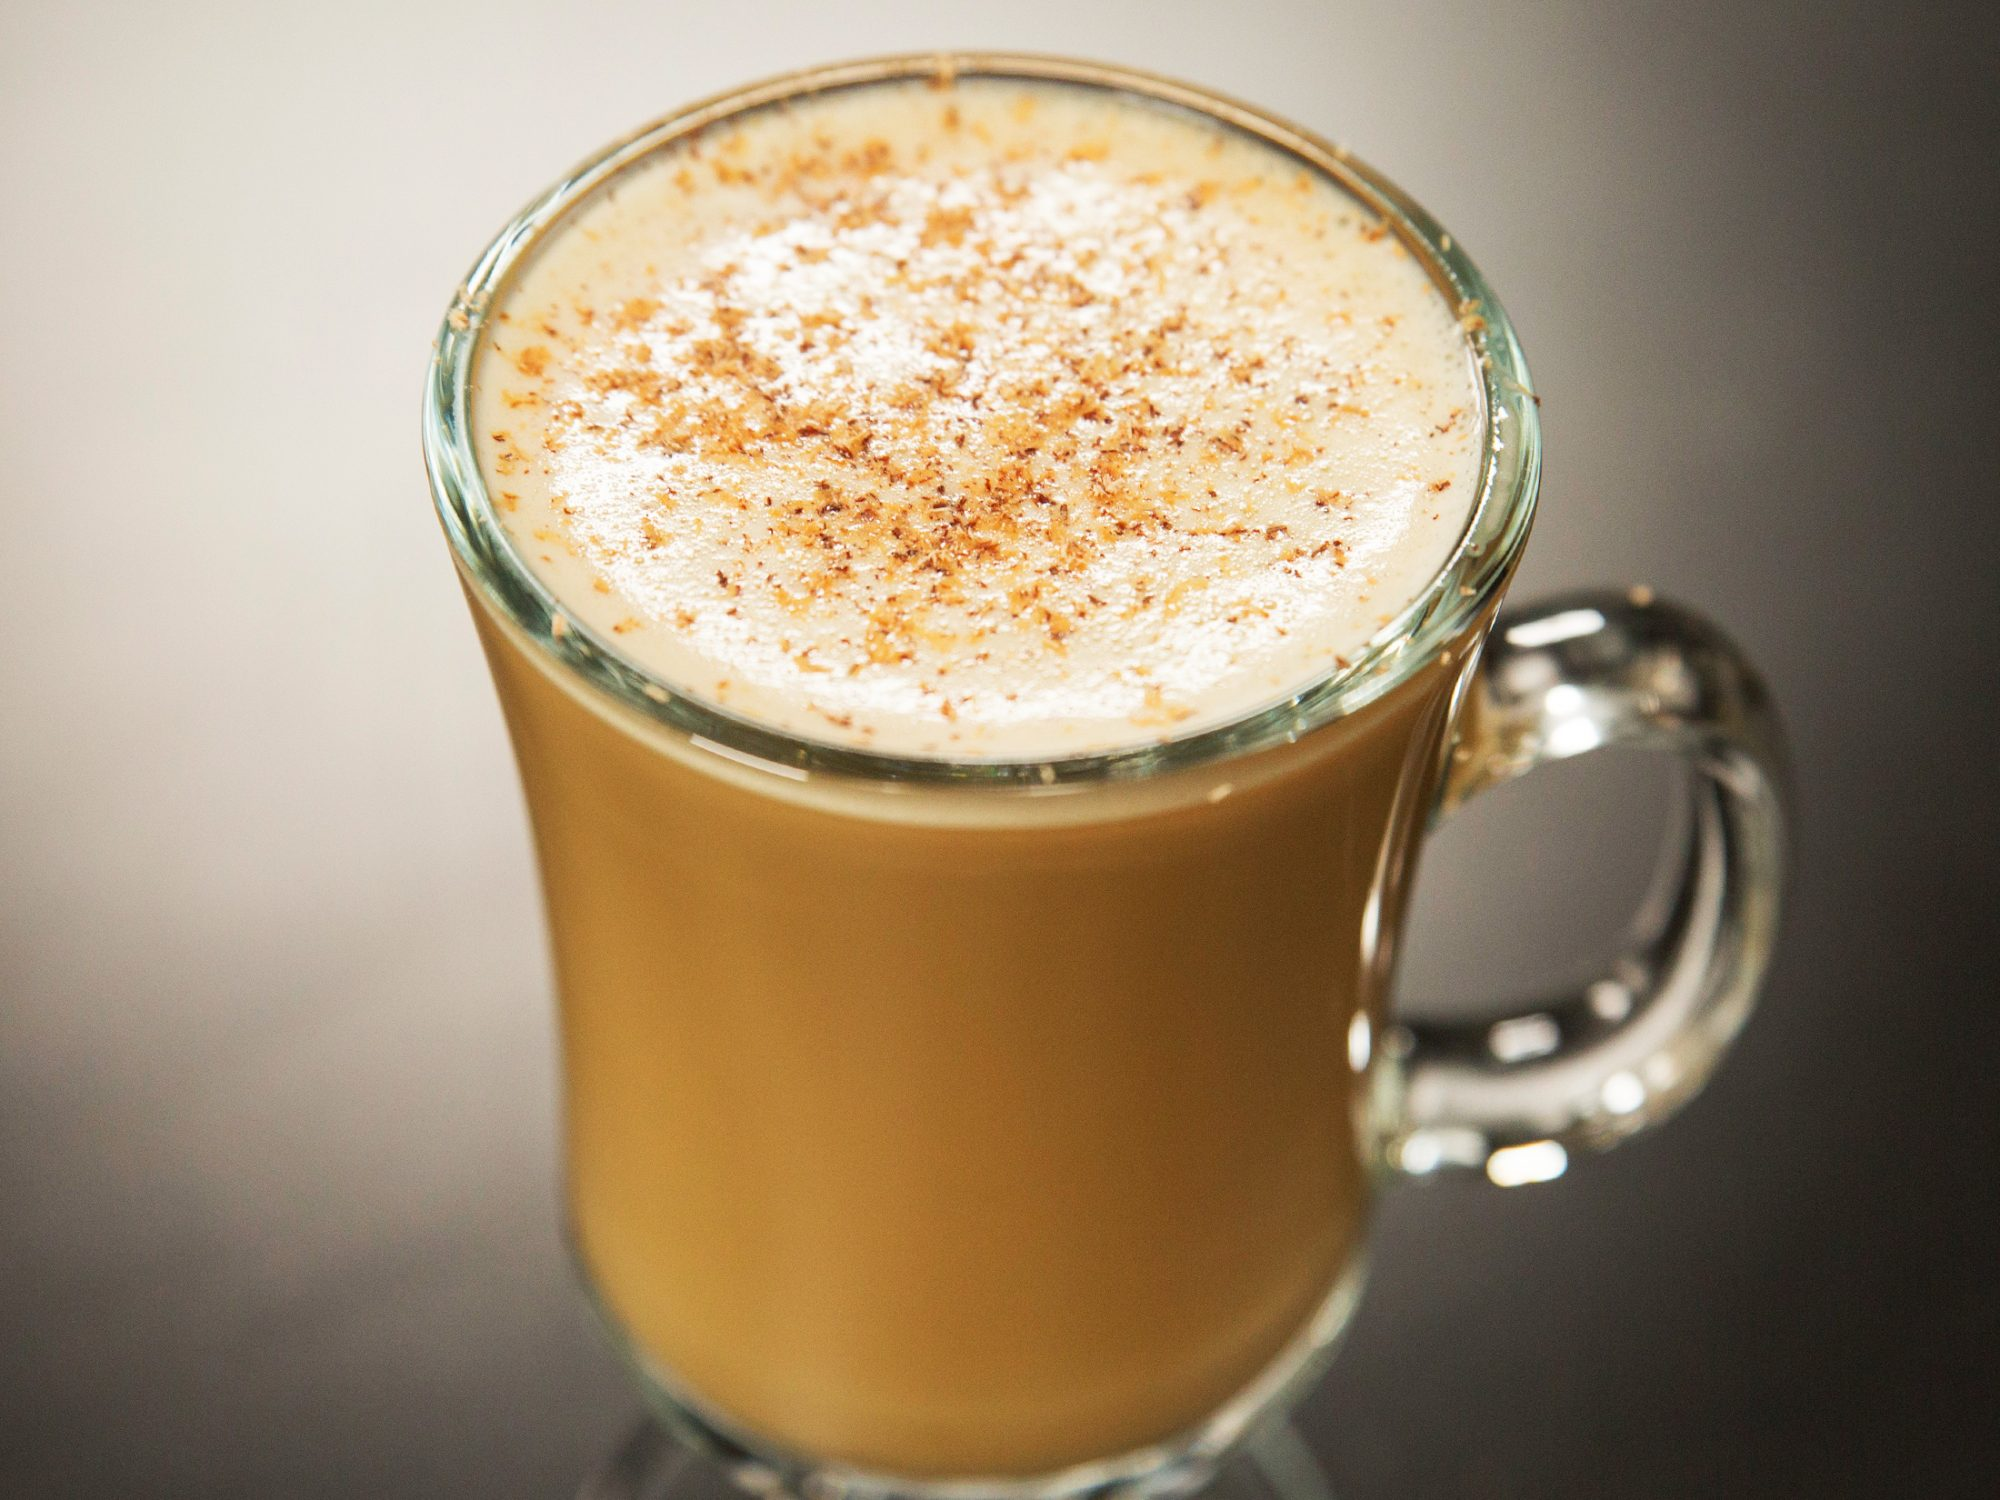 Copycat-Starbucks-Eggnog-Latte 2-DCMS-Large.jpg